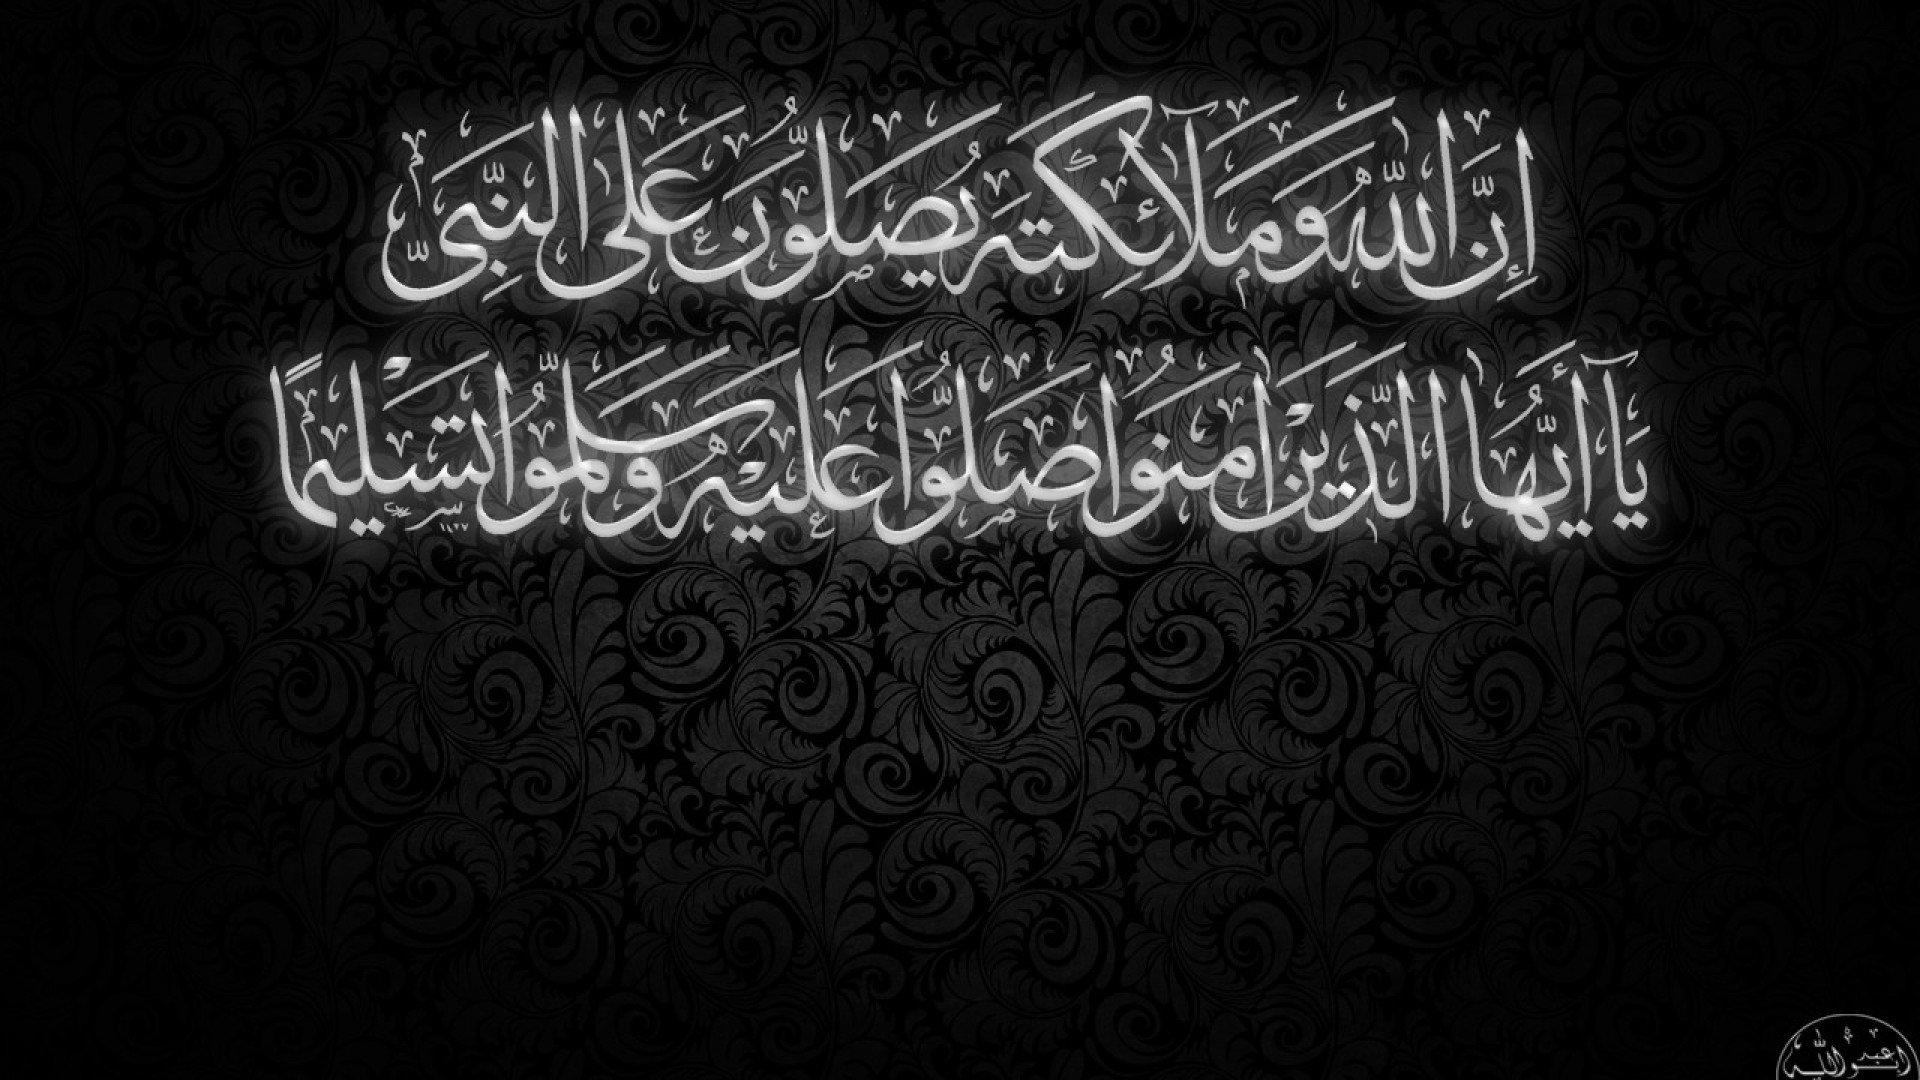 Wallpaper 1920x1080 Px Islam Muslim Religion 1920x1080